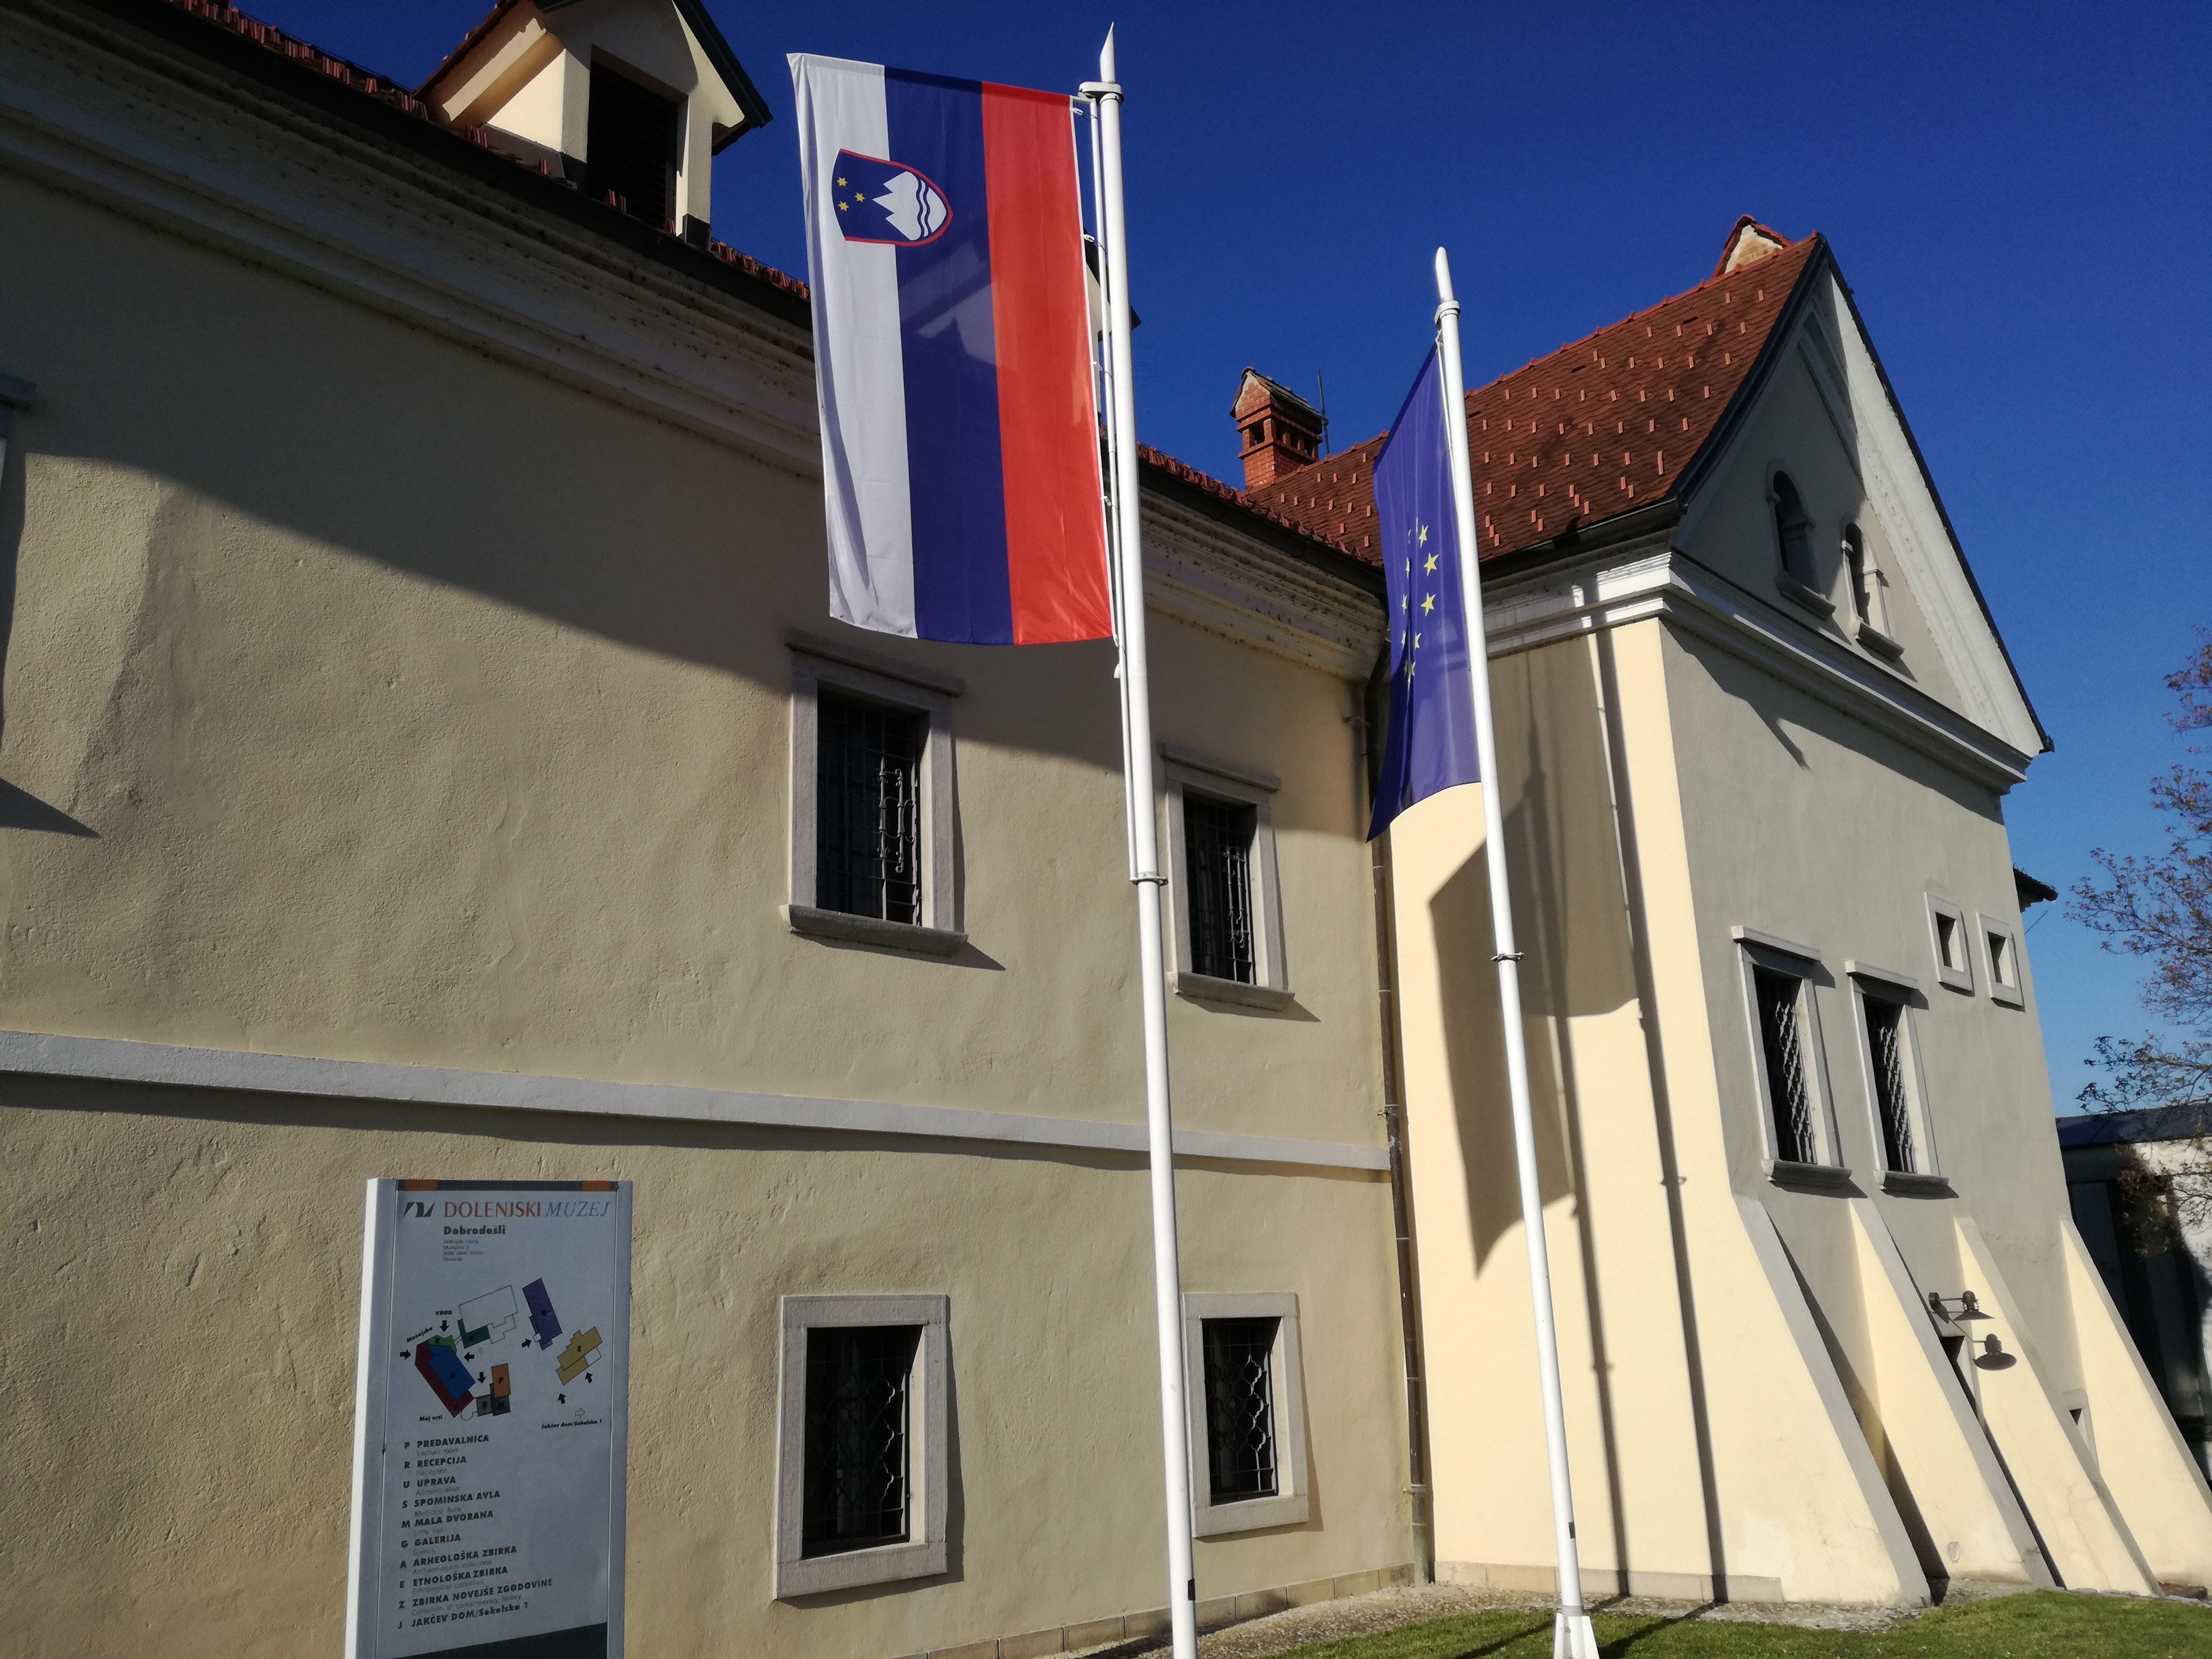 Dolenjski Múzeum